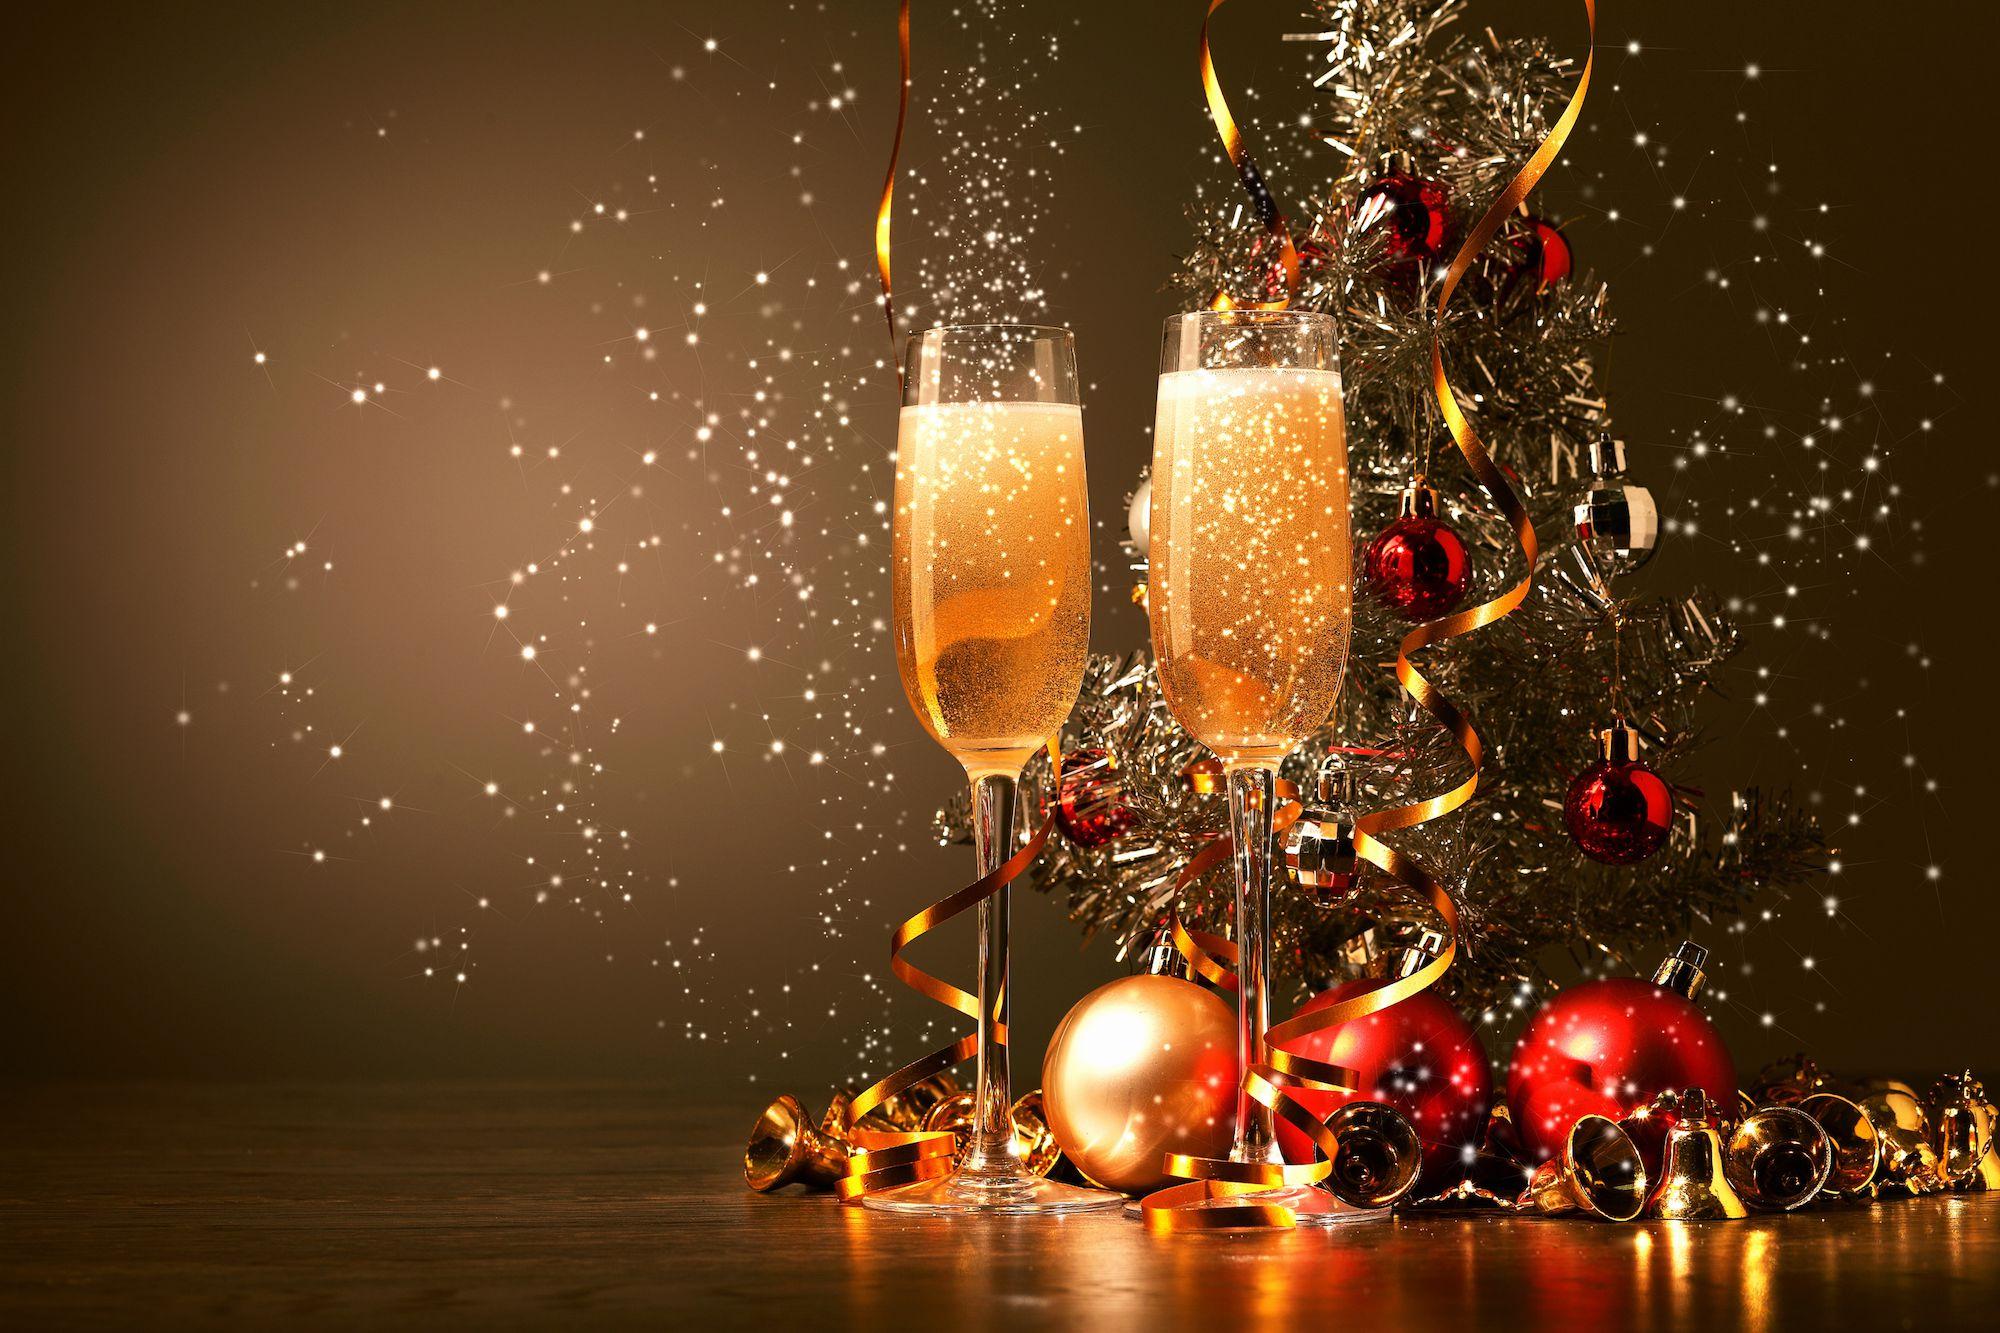 Glazen champagne tijdens kerstdagen